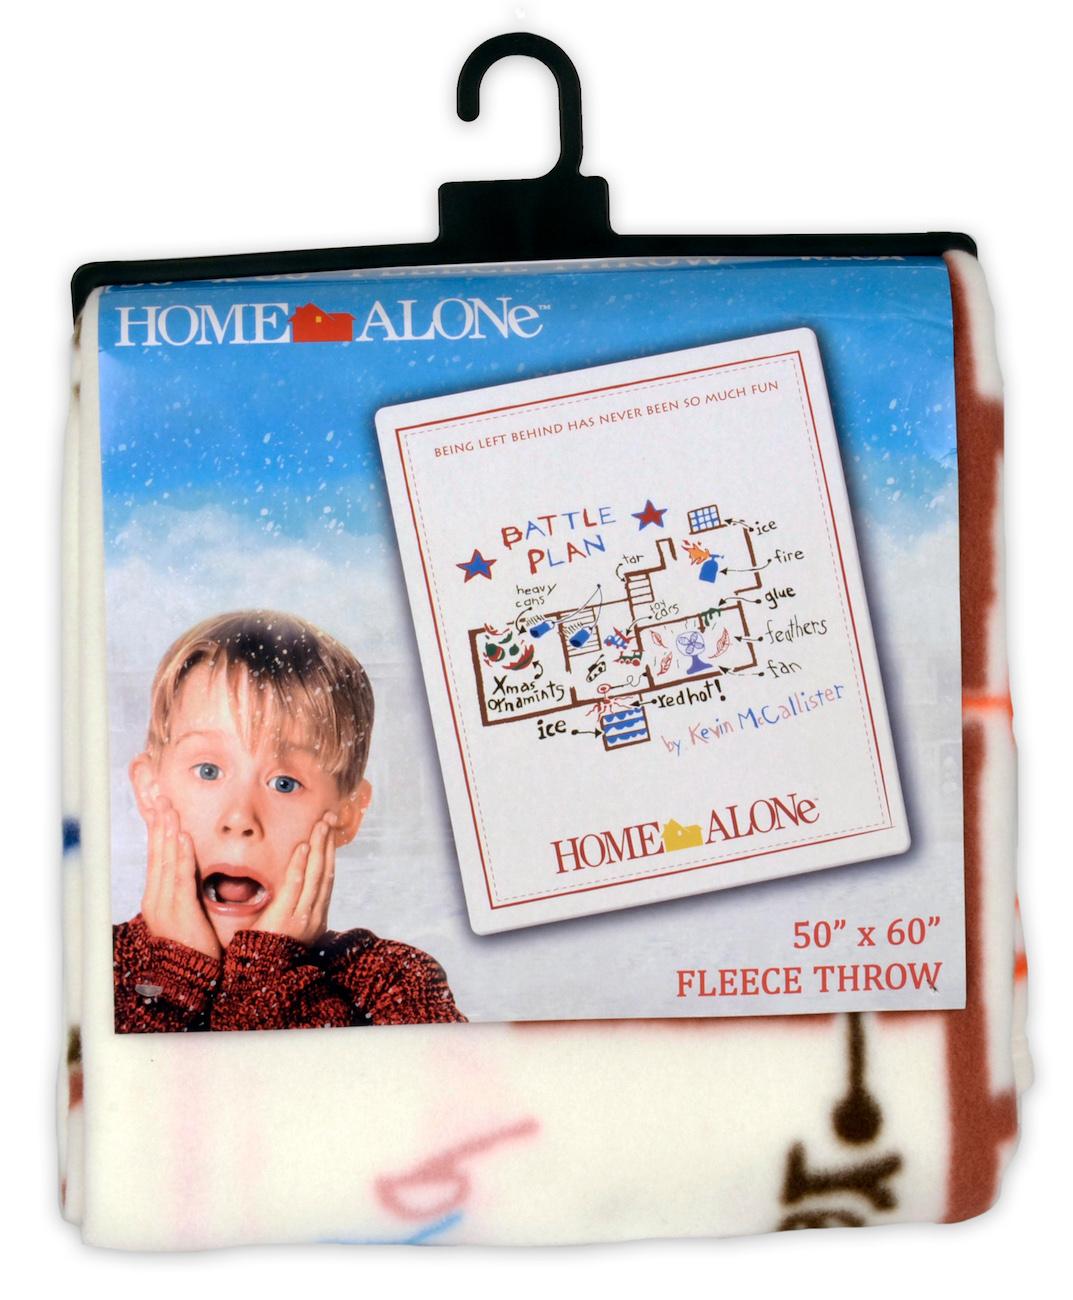 Home Alone Battle Plan Fleece Throw